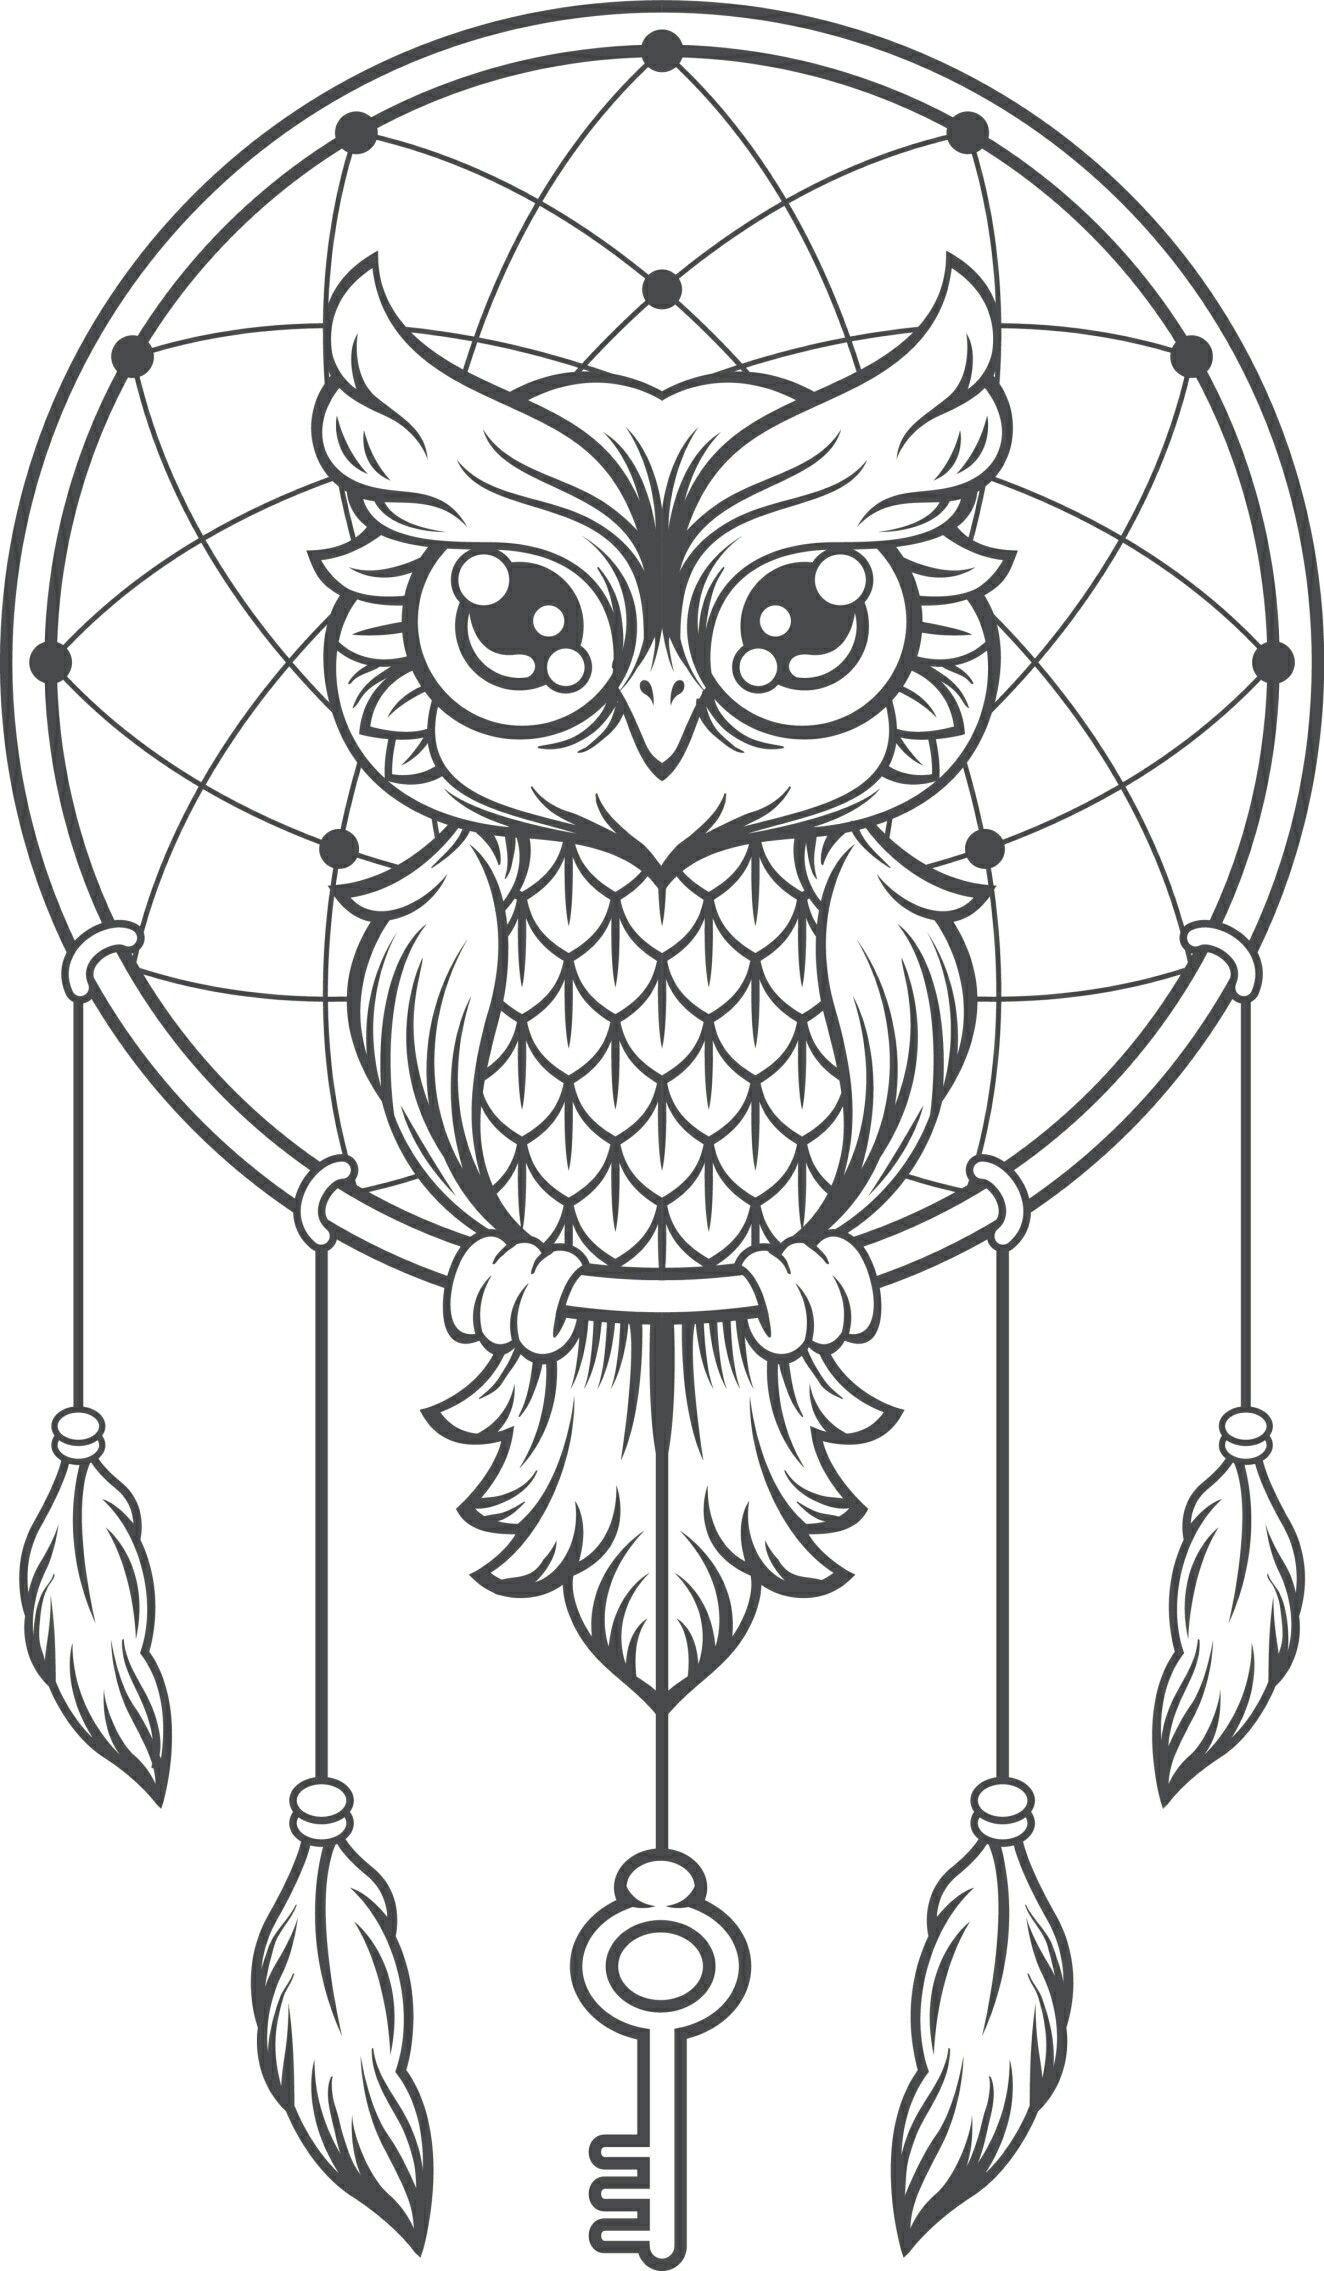 Tattoo Owl Dreamcatcher